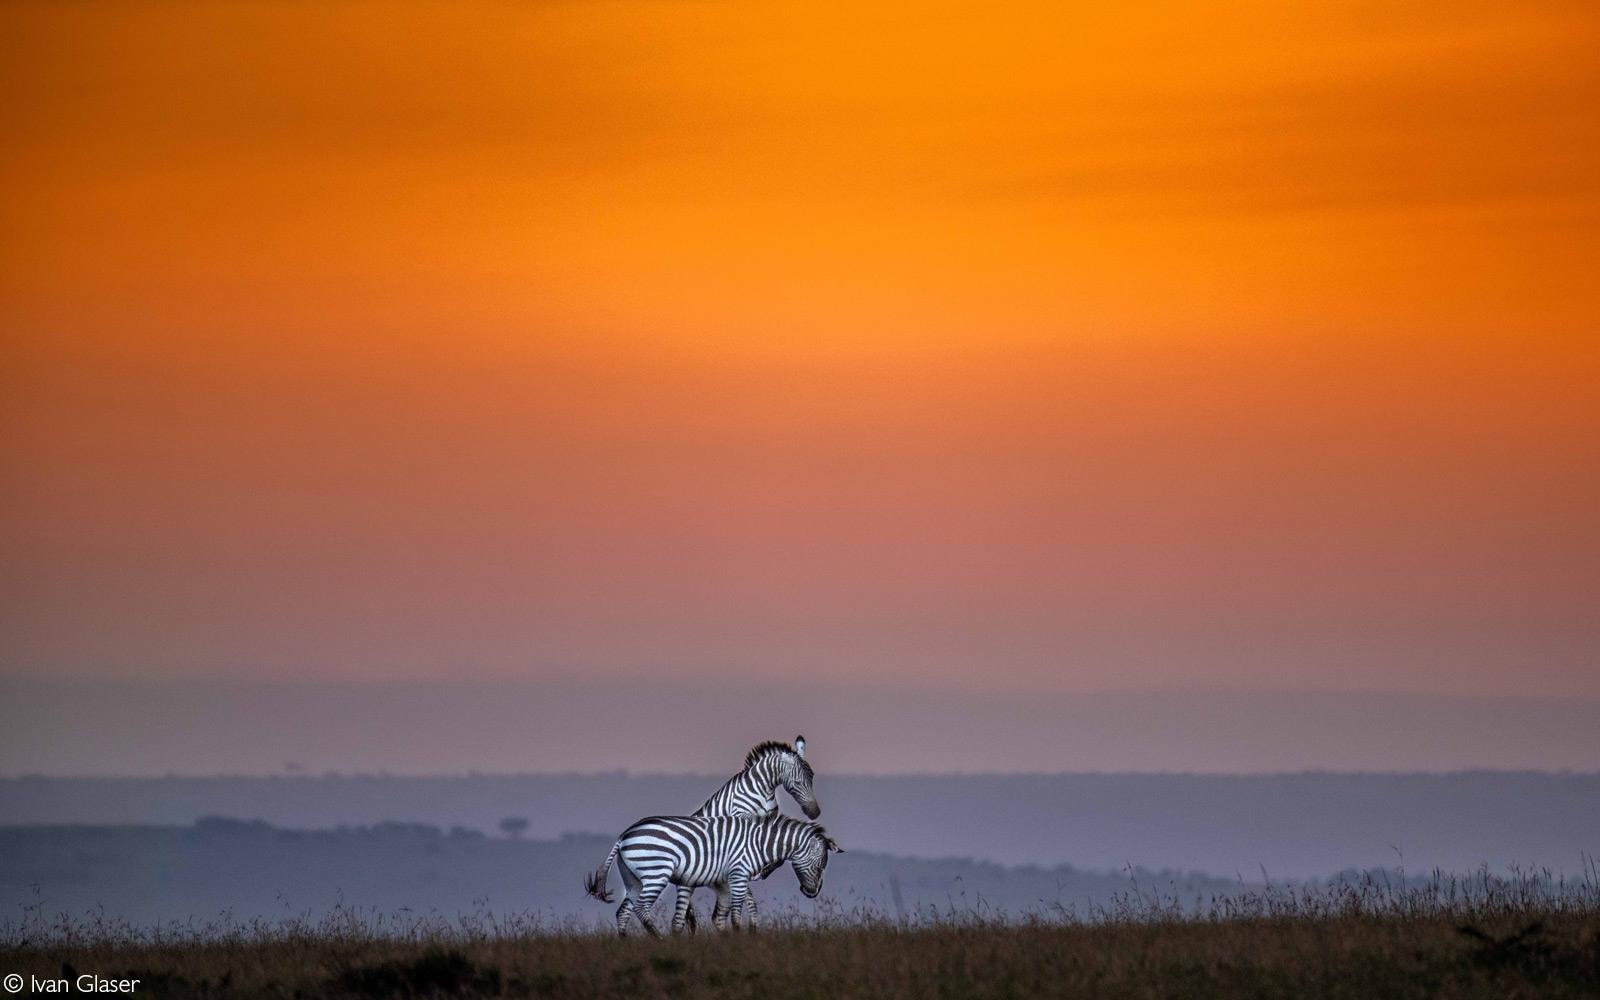 Zebra playing at dawn. Maasai Mara National Reserve, Kenya © Ivan Glaser